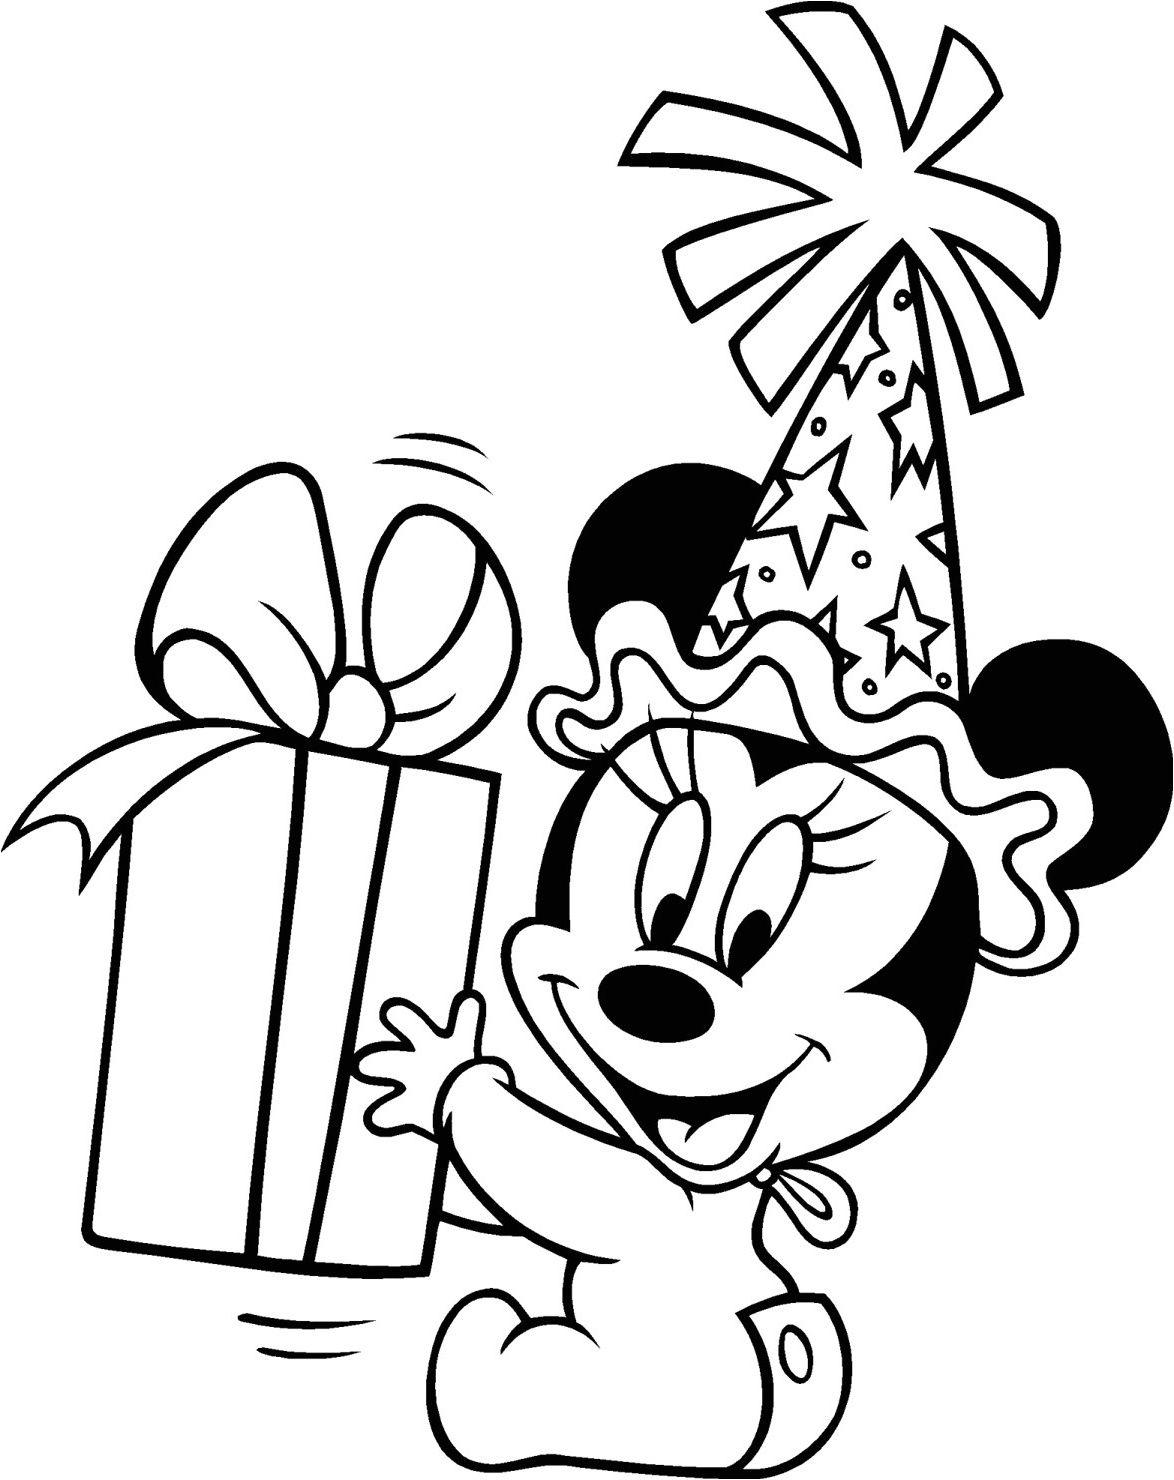 22 Meilleur De Coloriage Mickey Minnie Photos  Coloriage minnie